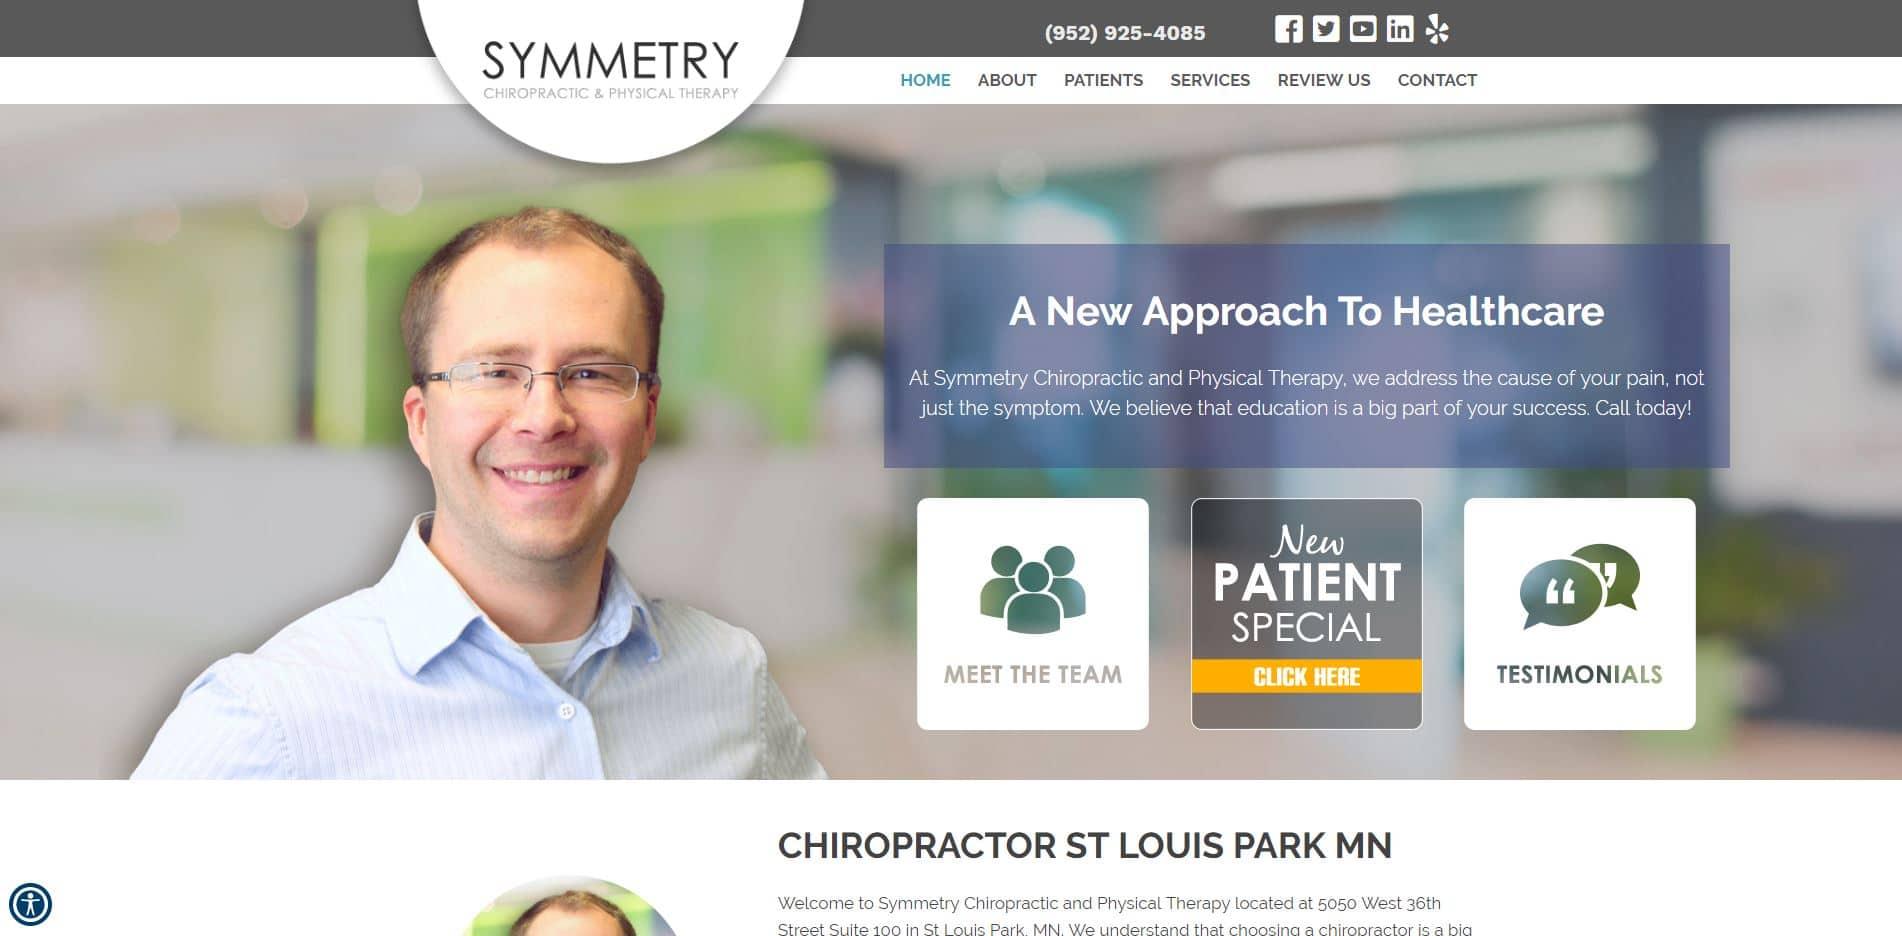 Chiropractor in St. Louis Park